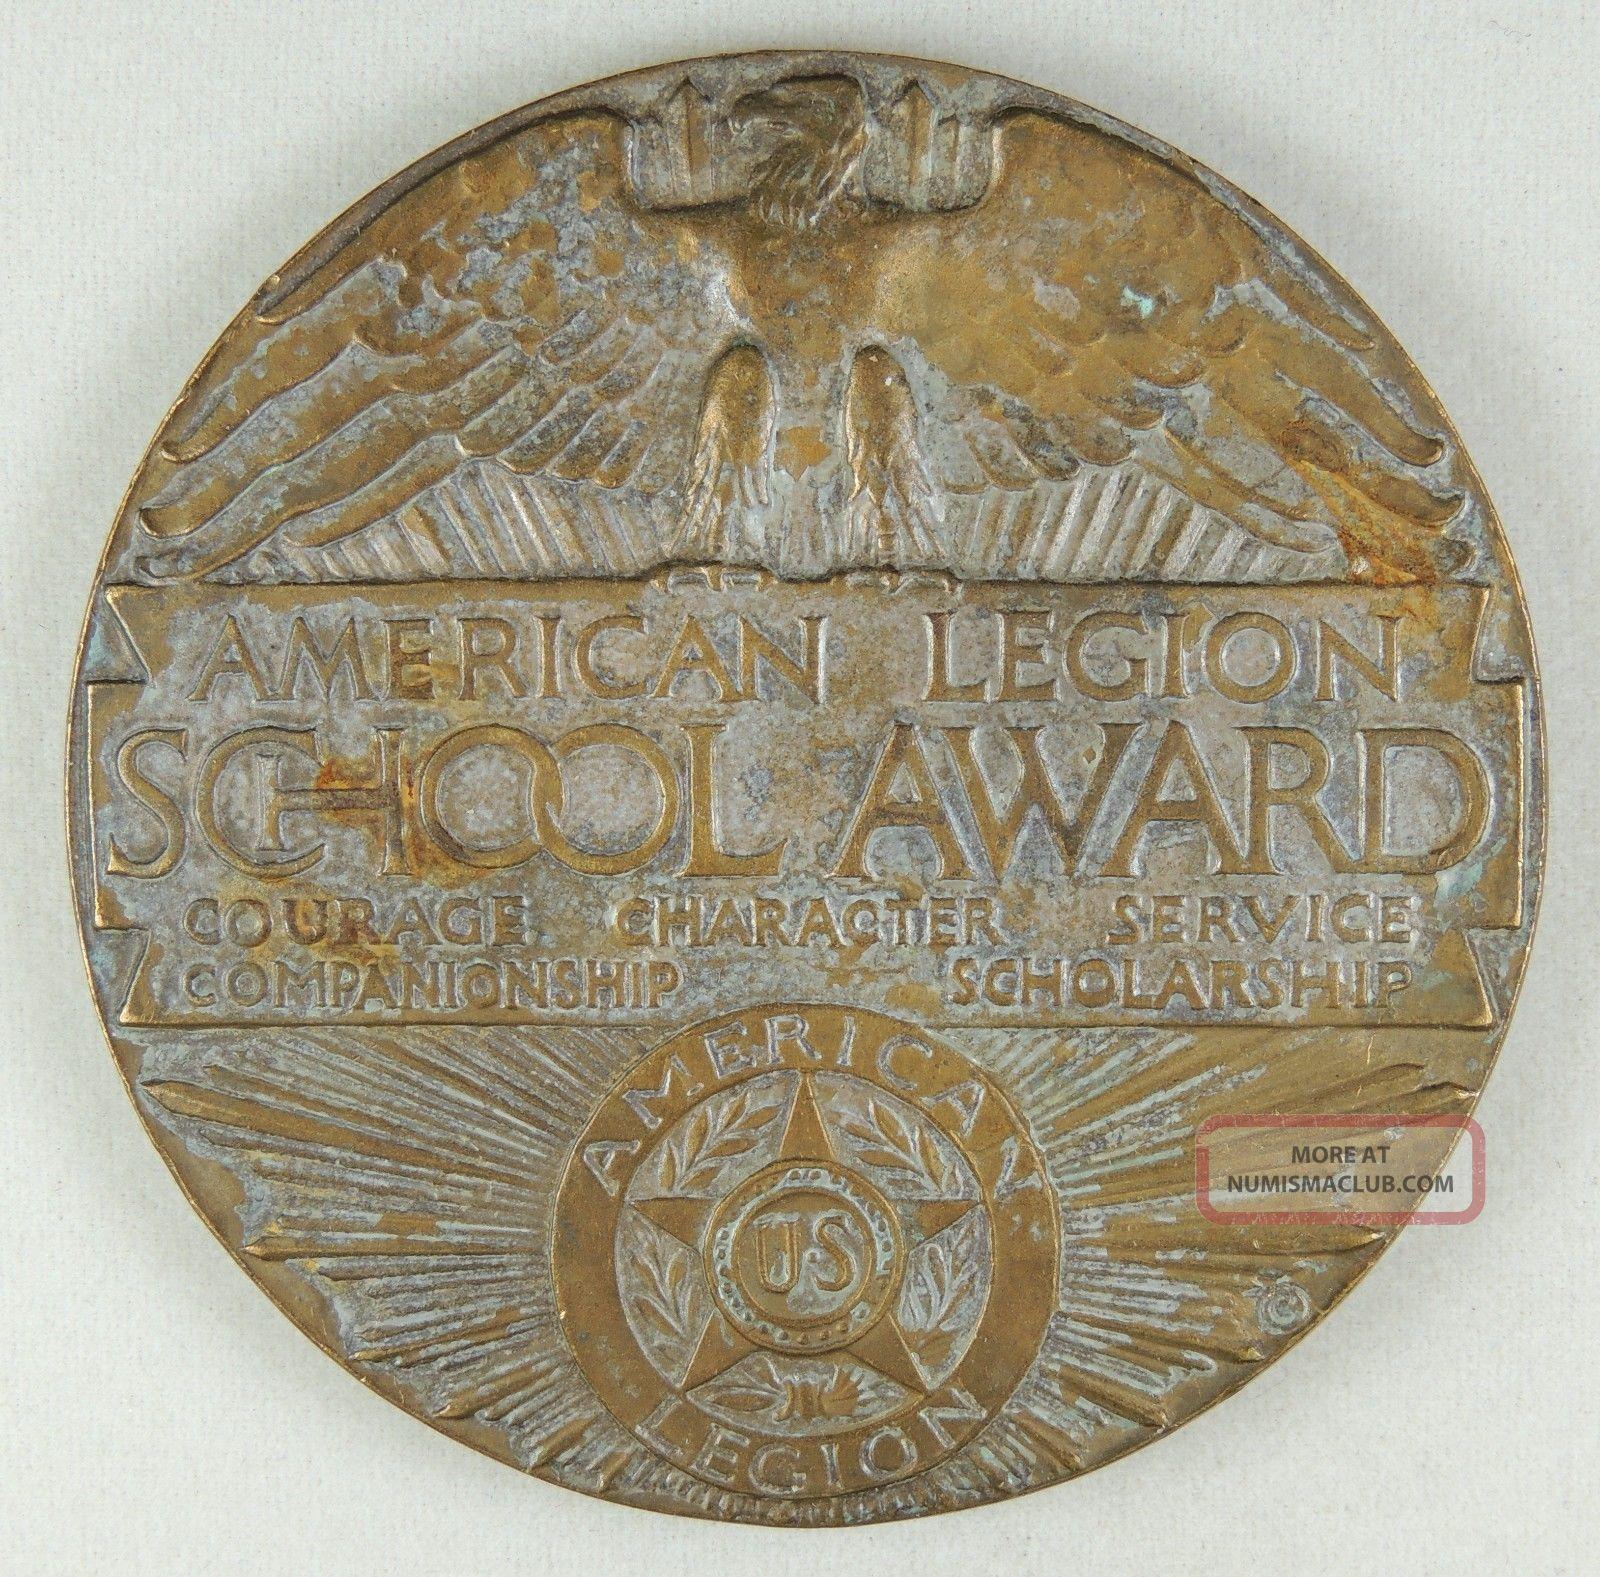 1925 American Legion School Award - Bronze Medal / Medallion - Medallic Art Co Ny Exonumia photo